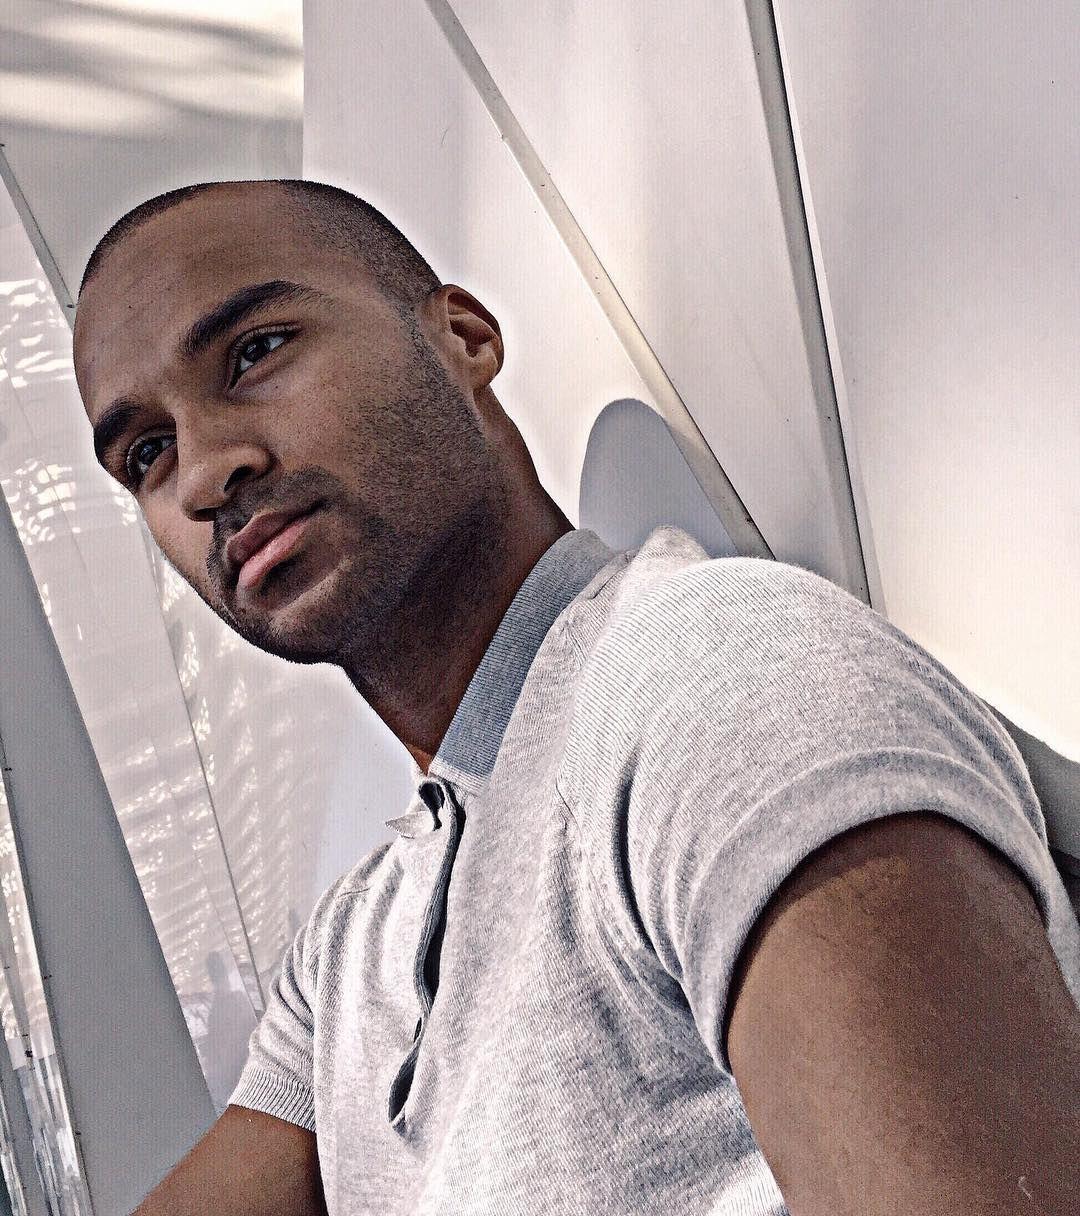 #morocco #marrakech #travelgram #boy #picoftheday #travel #vscocam #vsco  #igdaily #travel #africa #man #guy #gay #model #urban #filter #capture  #blackman ...